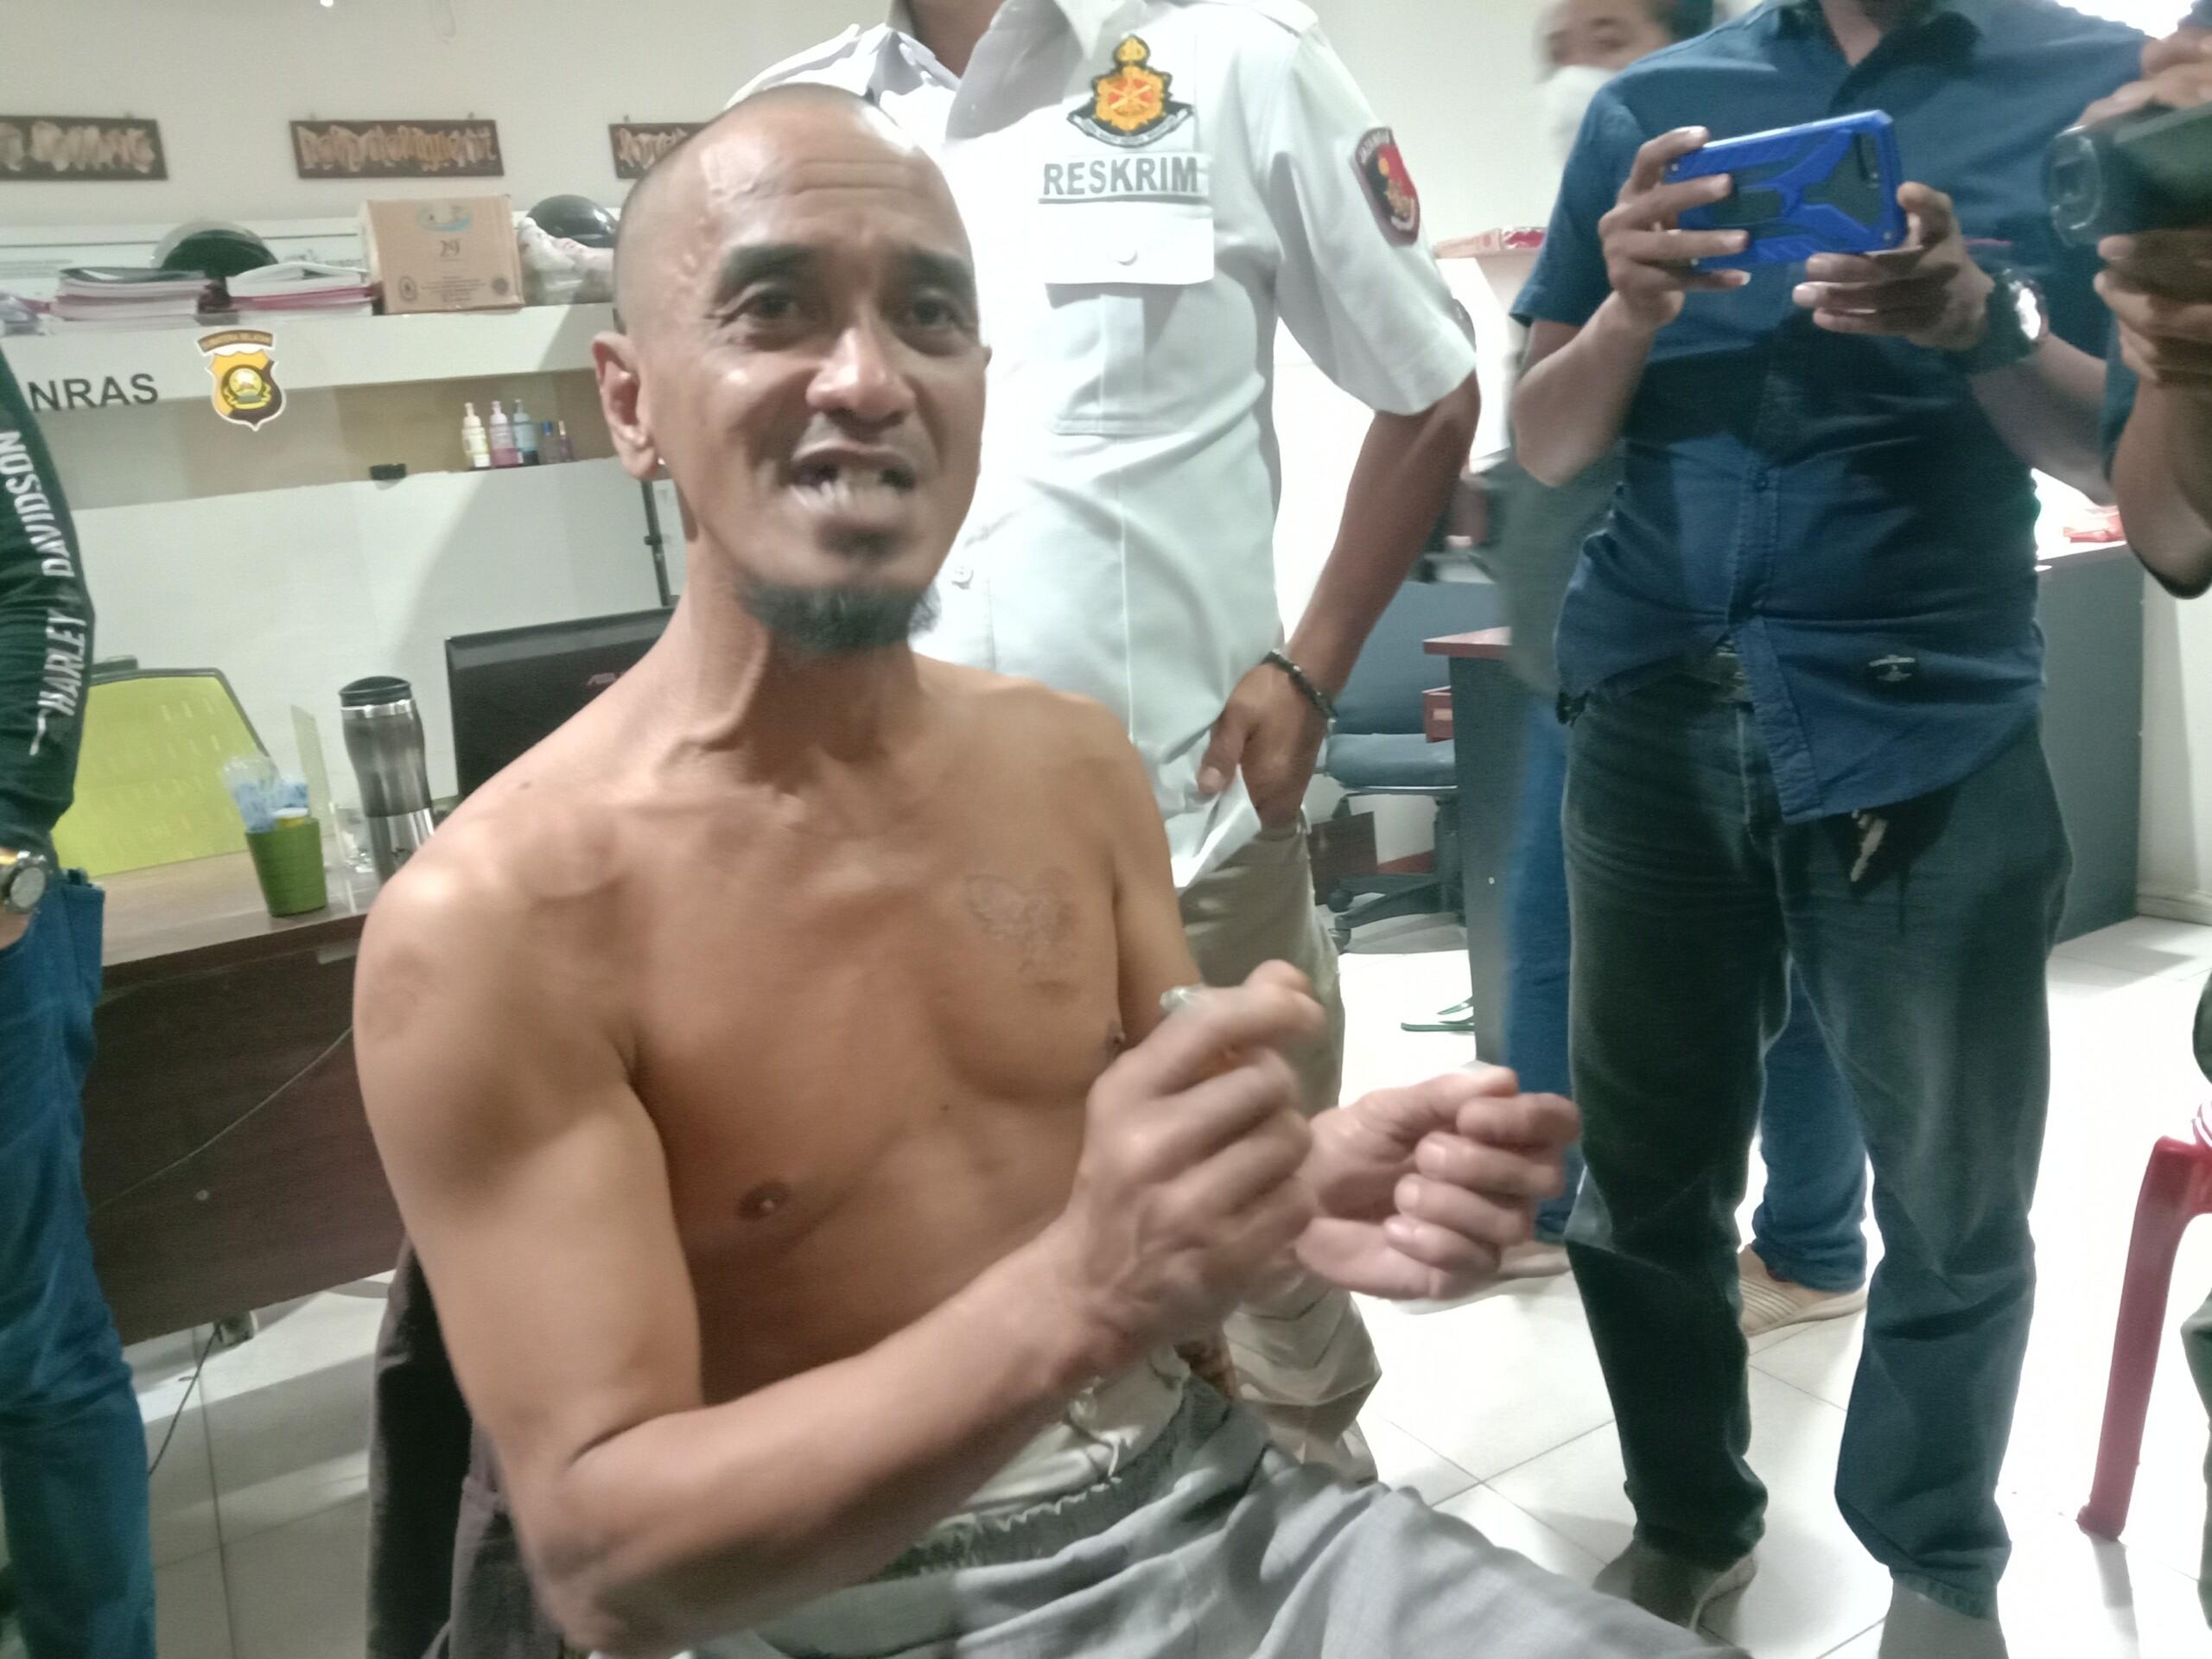 RM ditangkap Tim Polda Sumsel usai membakar musala di Palembang (Dede Febryansyah / Mattanews.co)